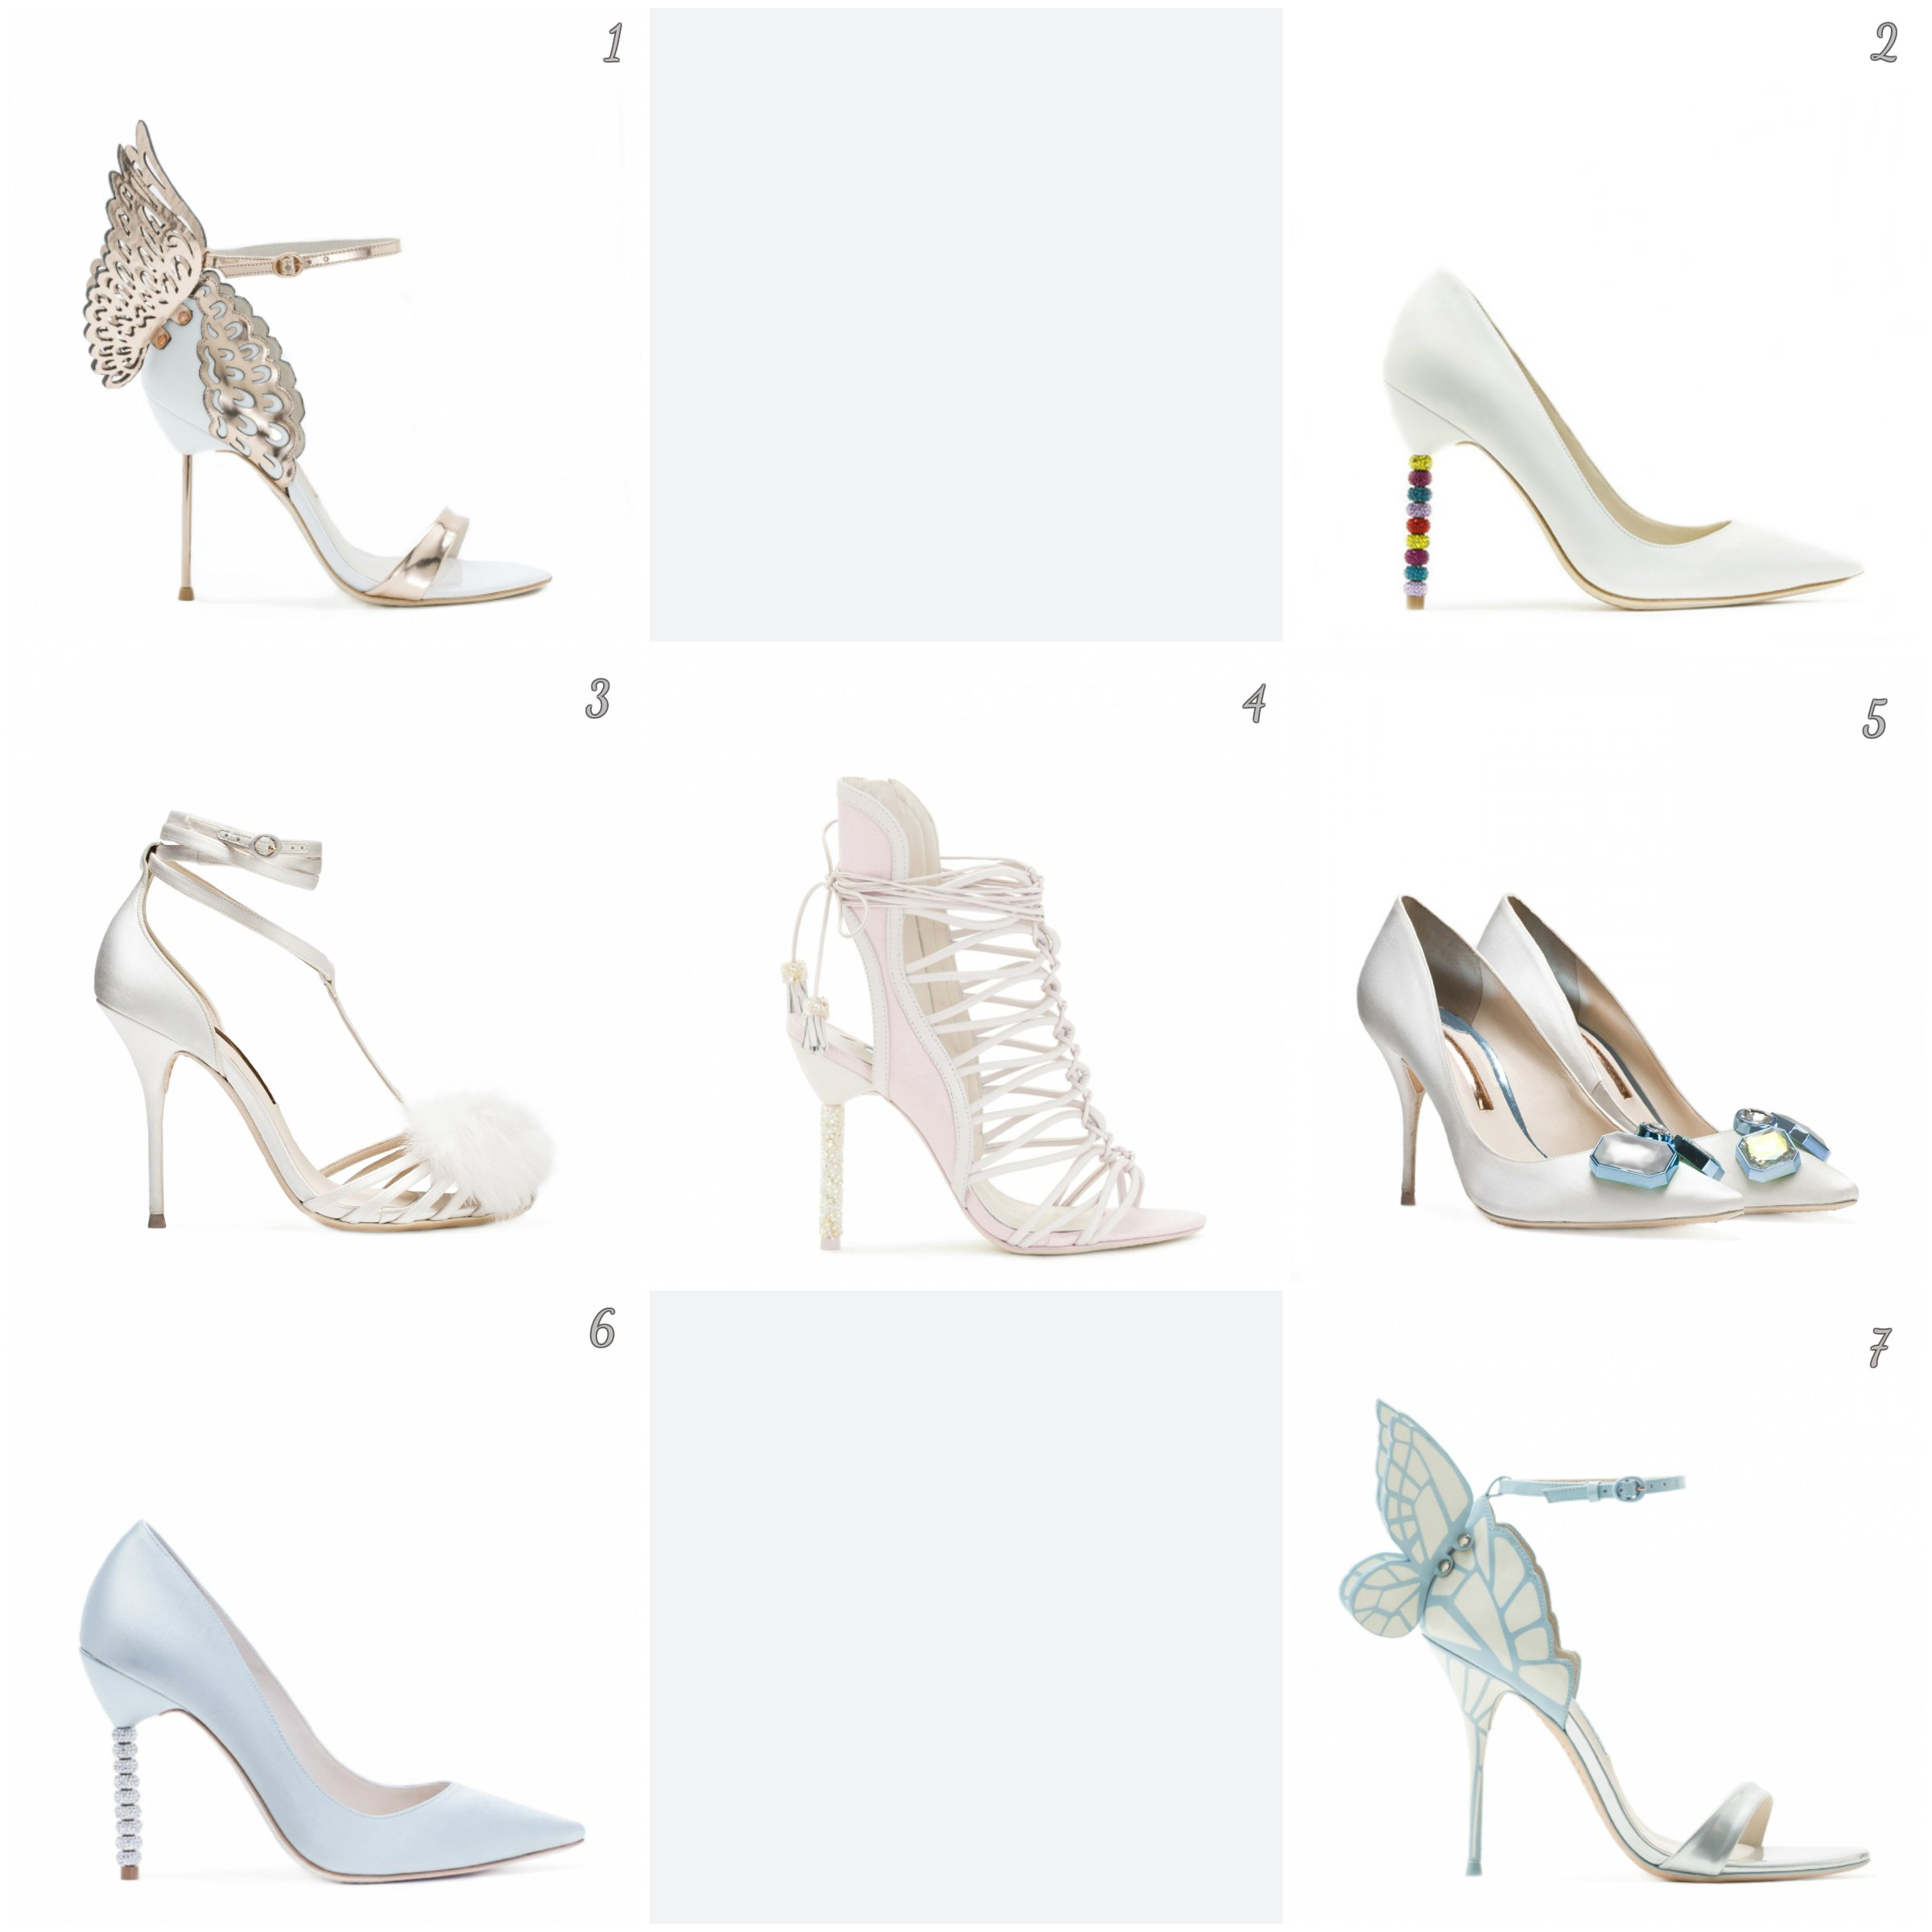 8cd4a540a3ac ... Chiara Ice sandal £450. sophia webster